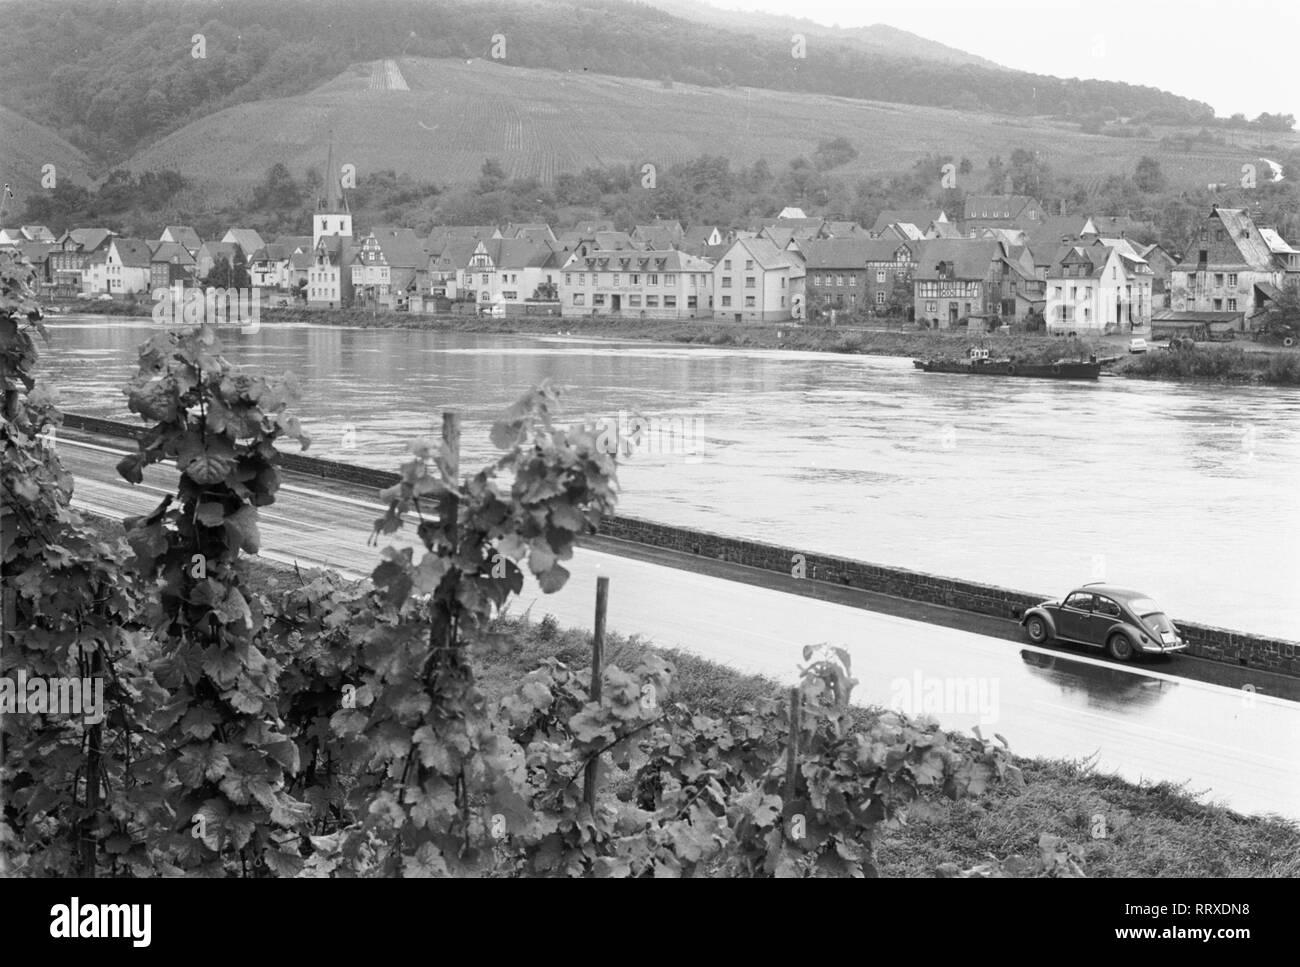 VW Beetle - Käfer, Beetle, VW, Auto, Fluss, Rhein, Stadt, Weinberg - Stock Image